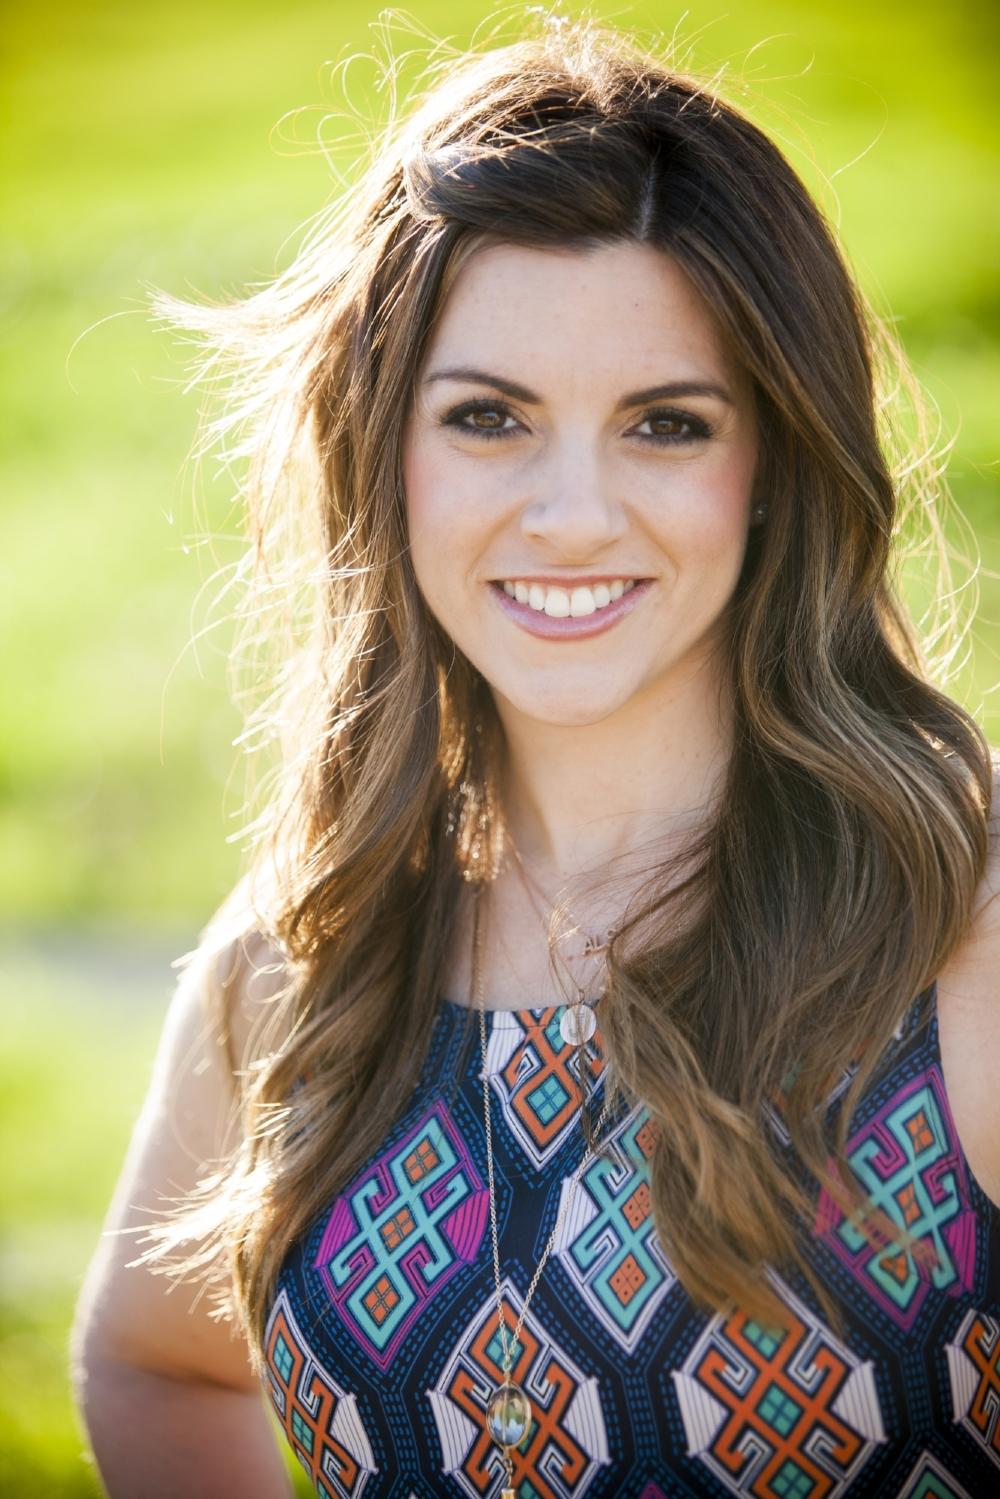 Alexandra Spitz - Host, Owner of The New Mom School